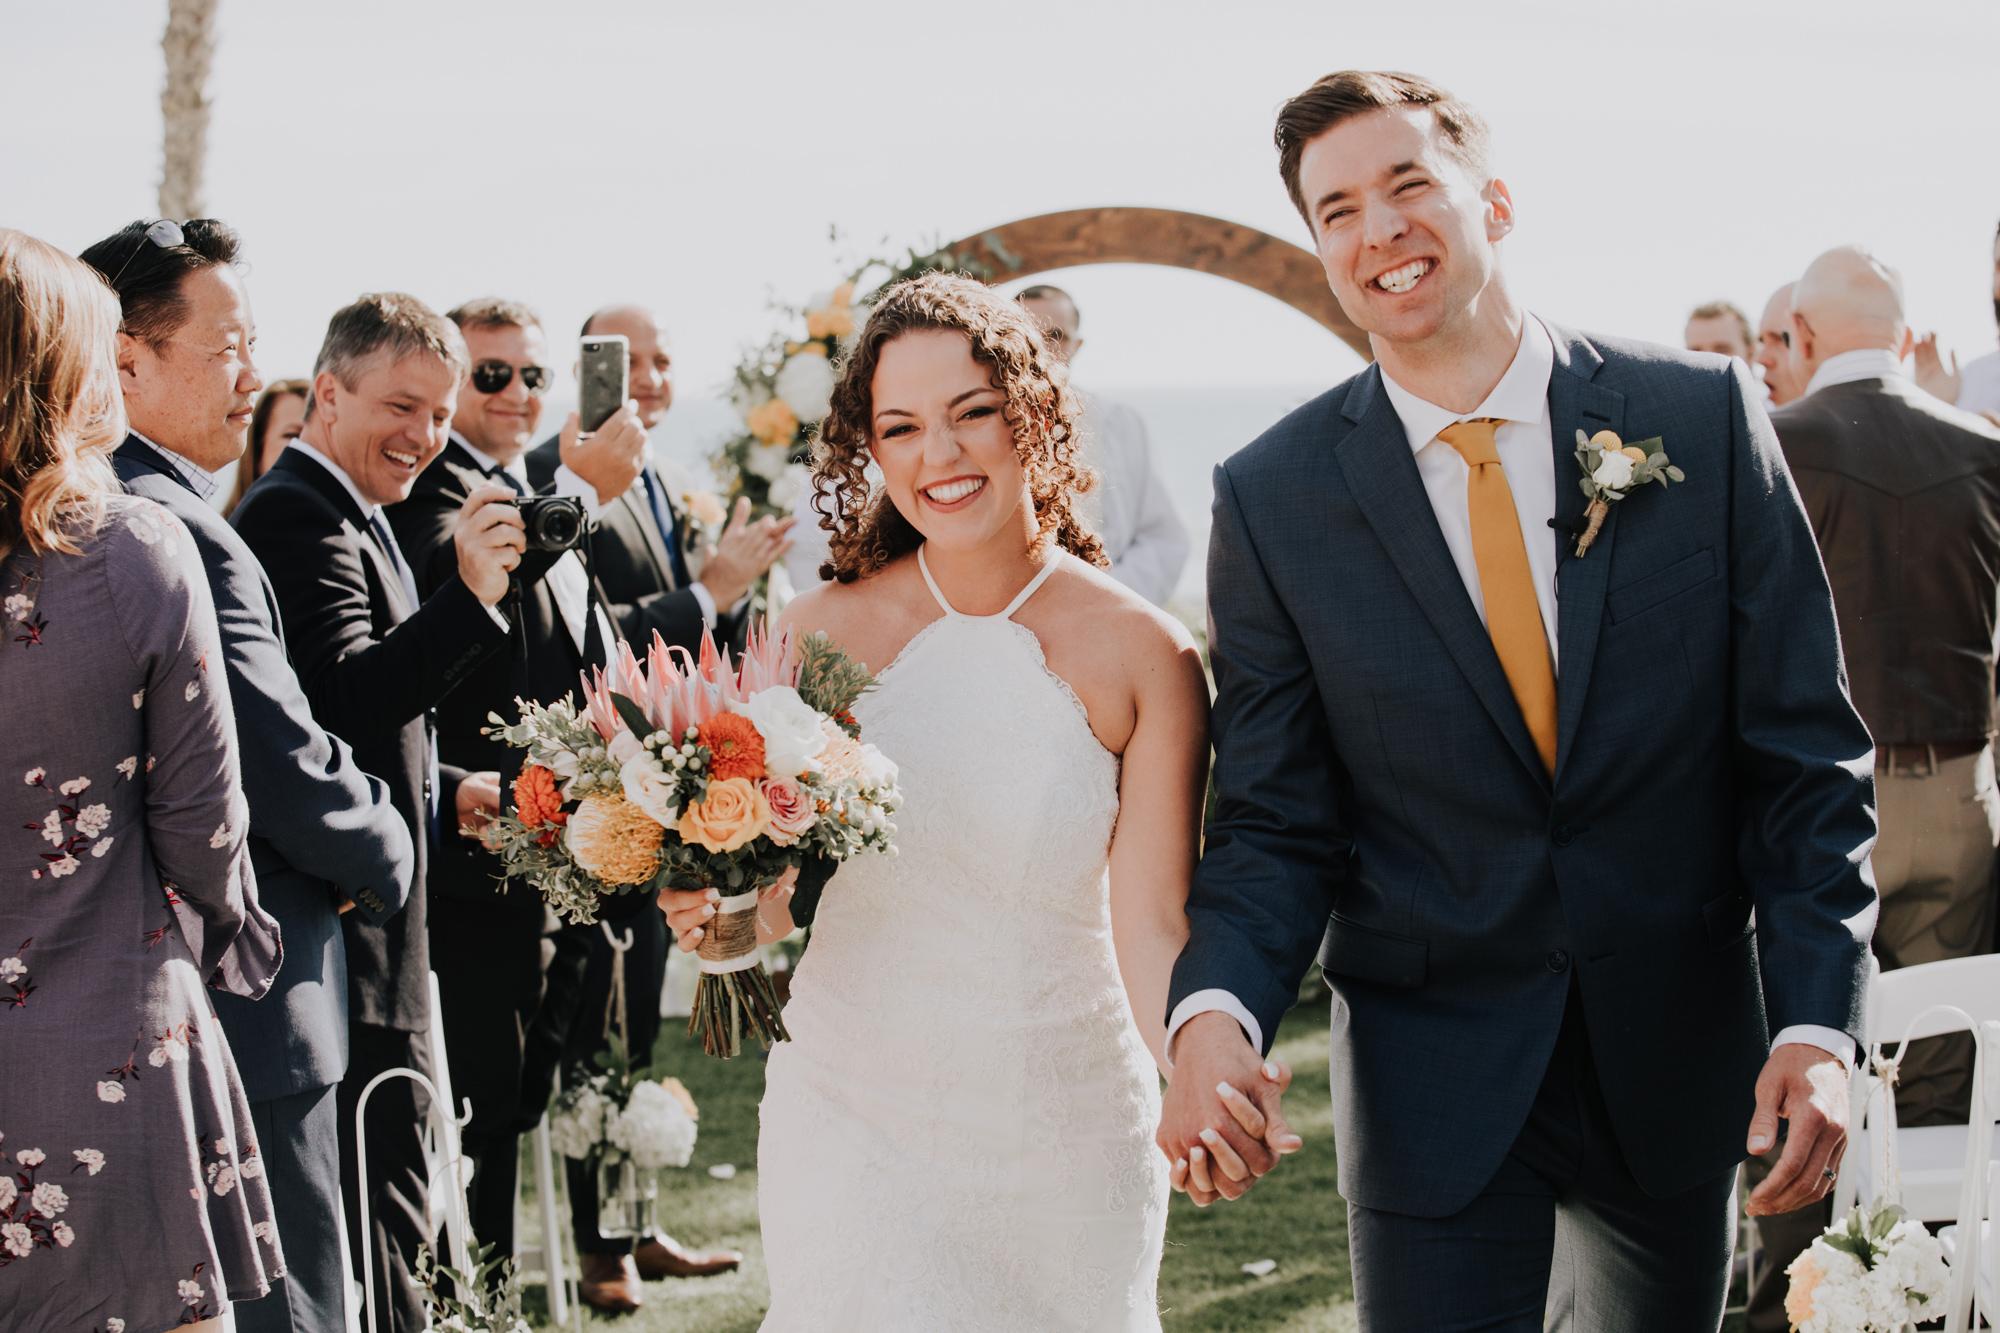 092-destination-wedding-san-clemente-california.jpg